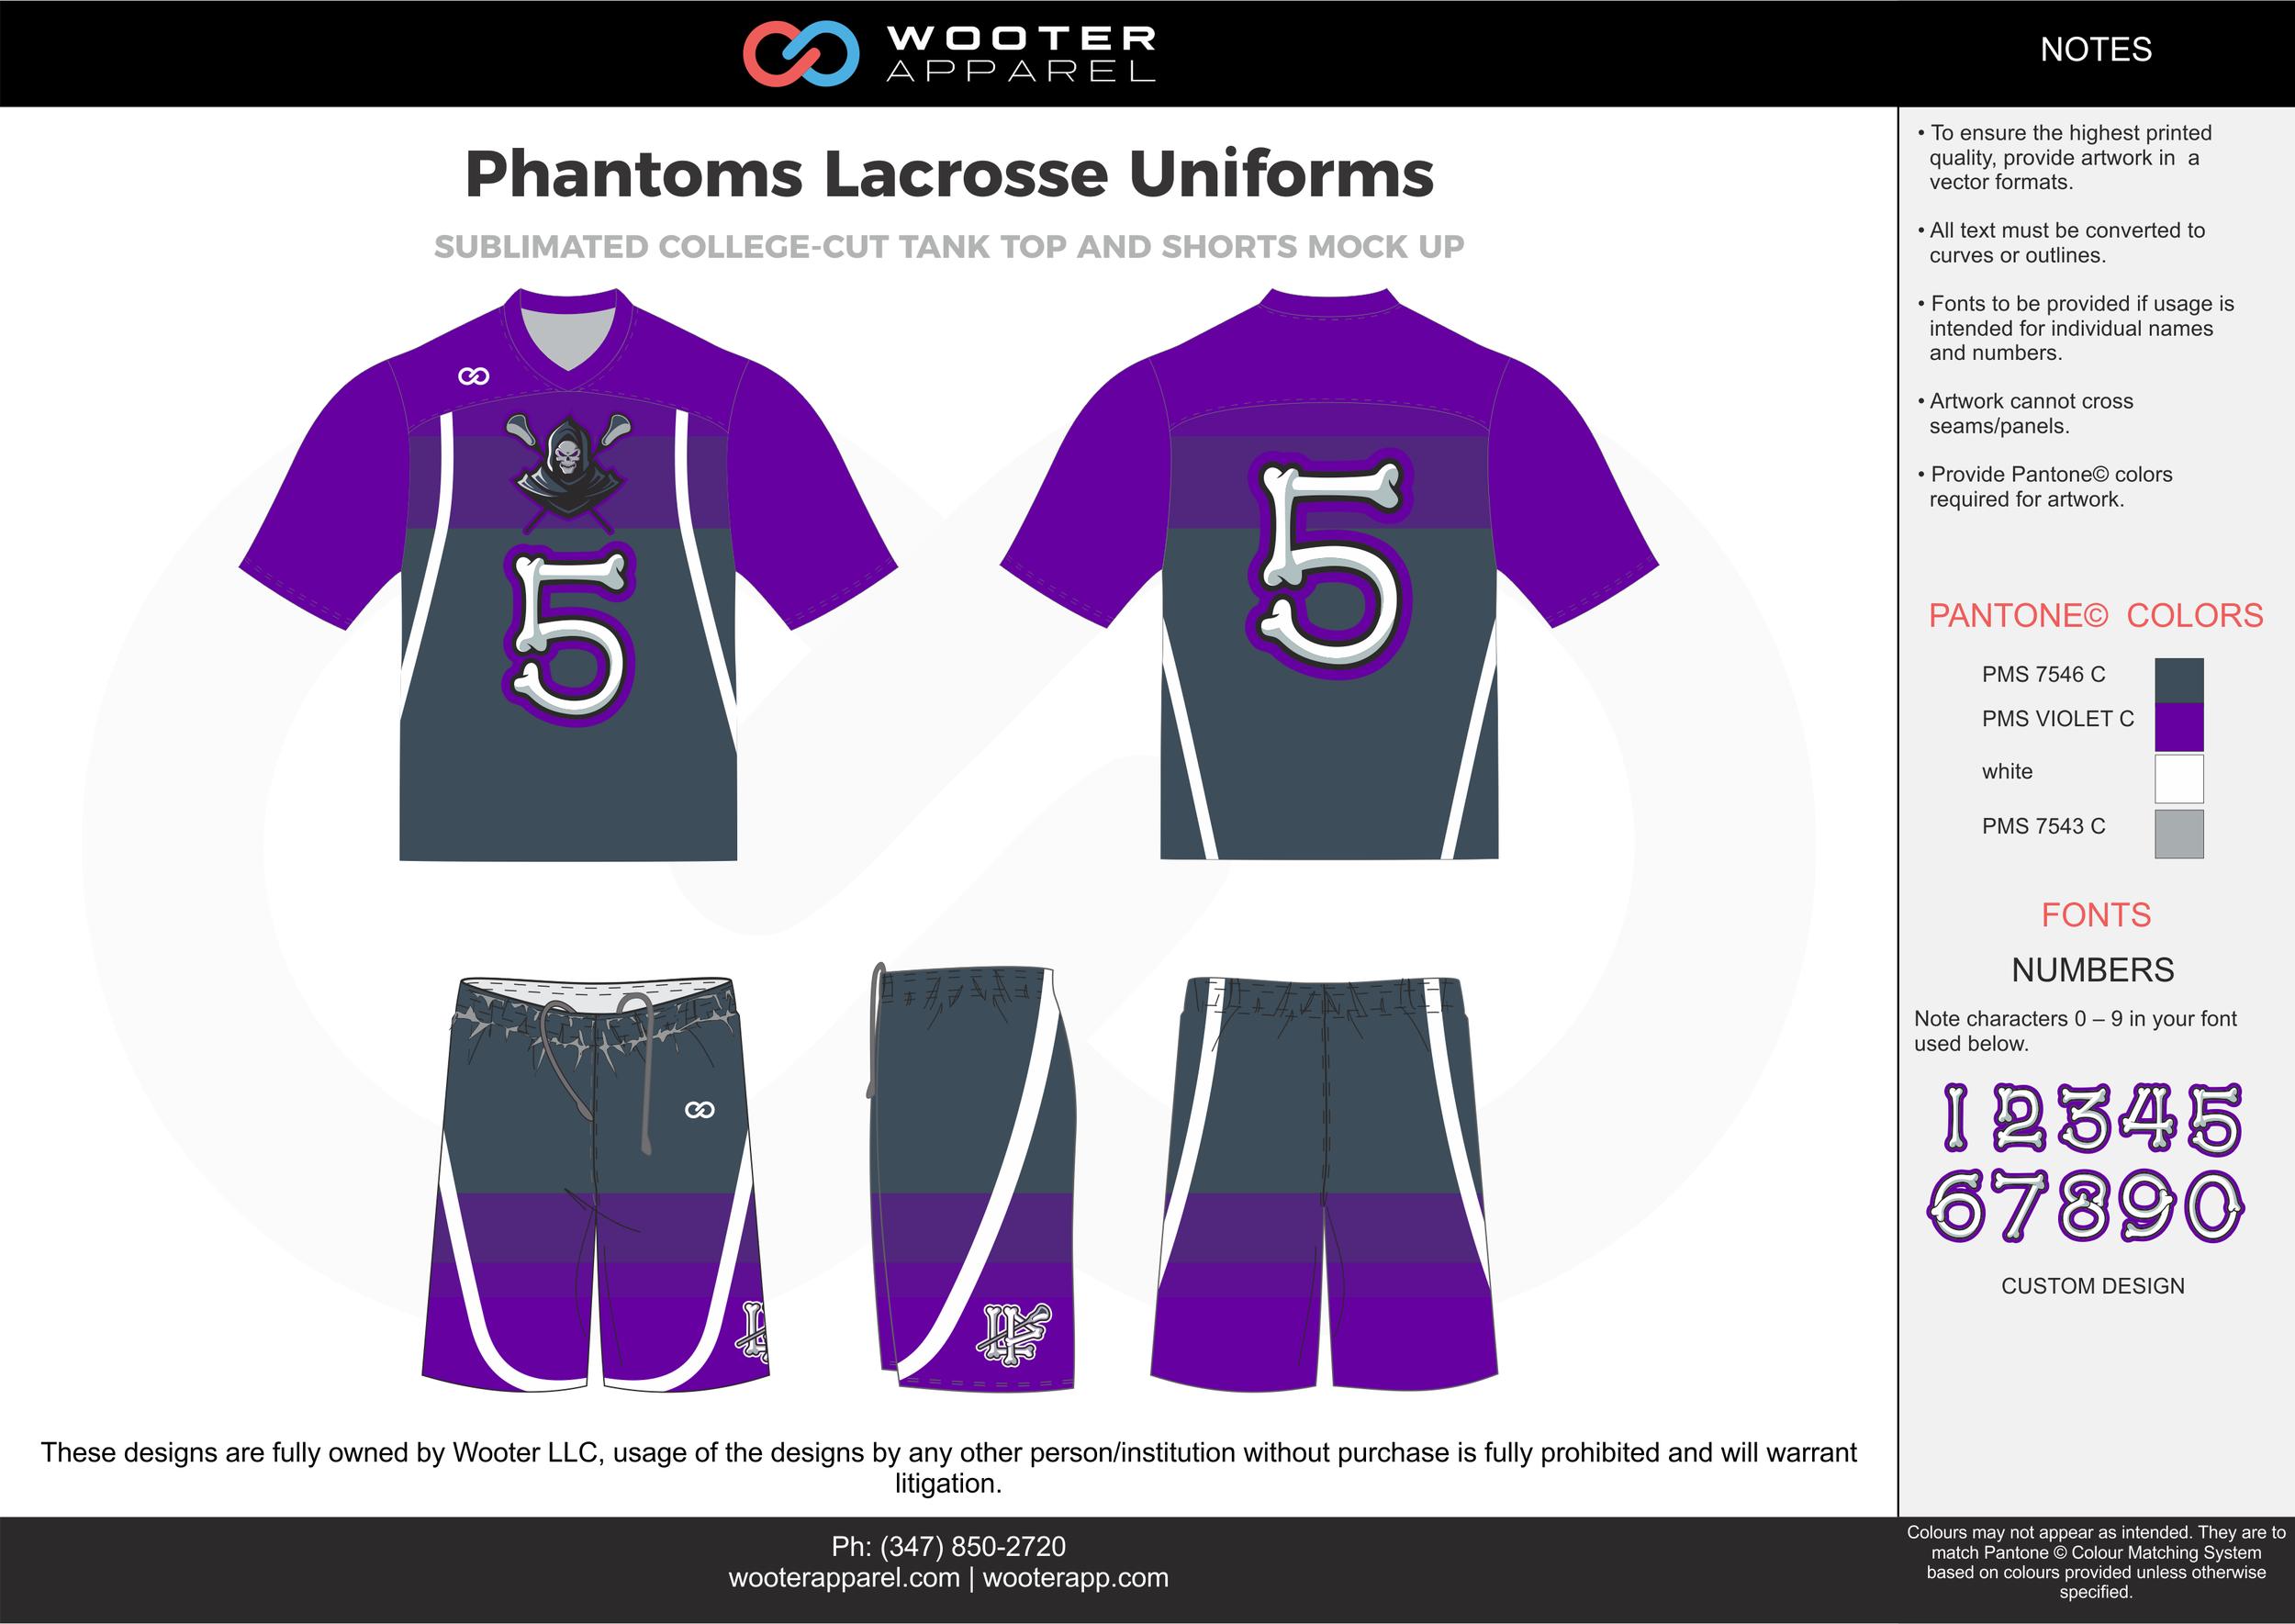 PANTHOMS LACROSSE UNIFORMS violet gray white Lacrosse uniforms jerseys shirts shorts